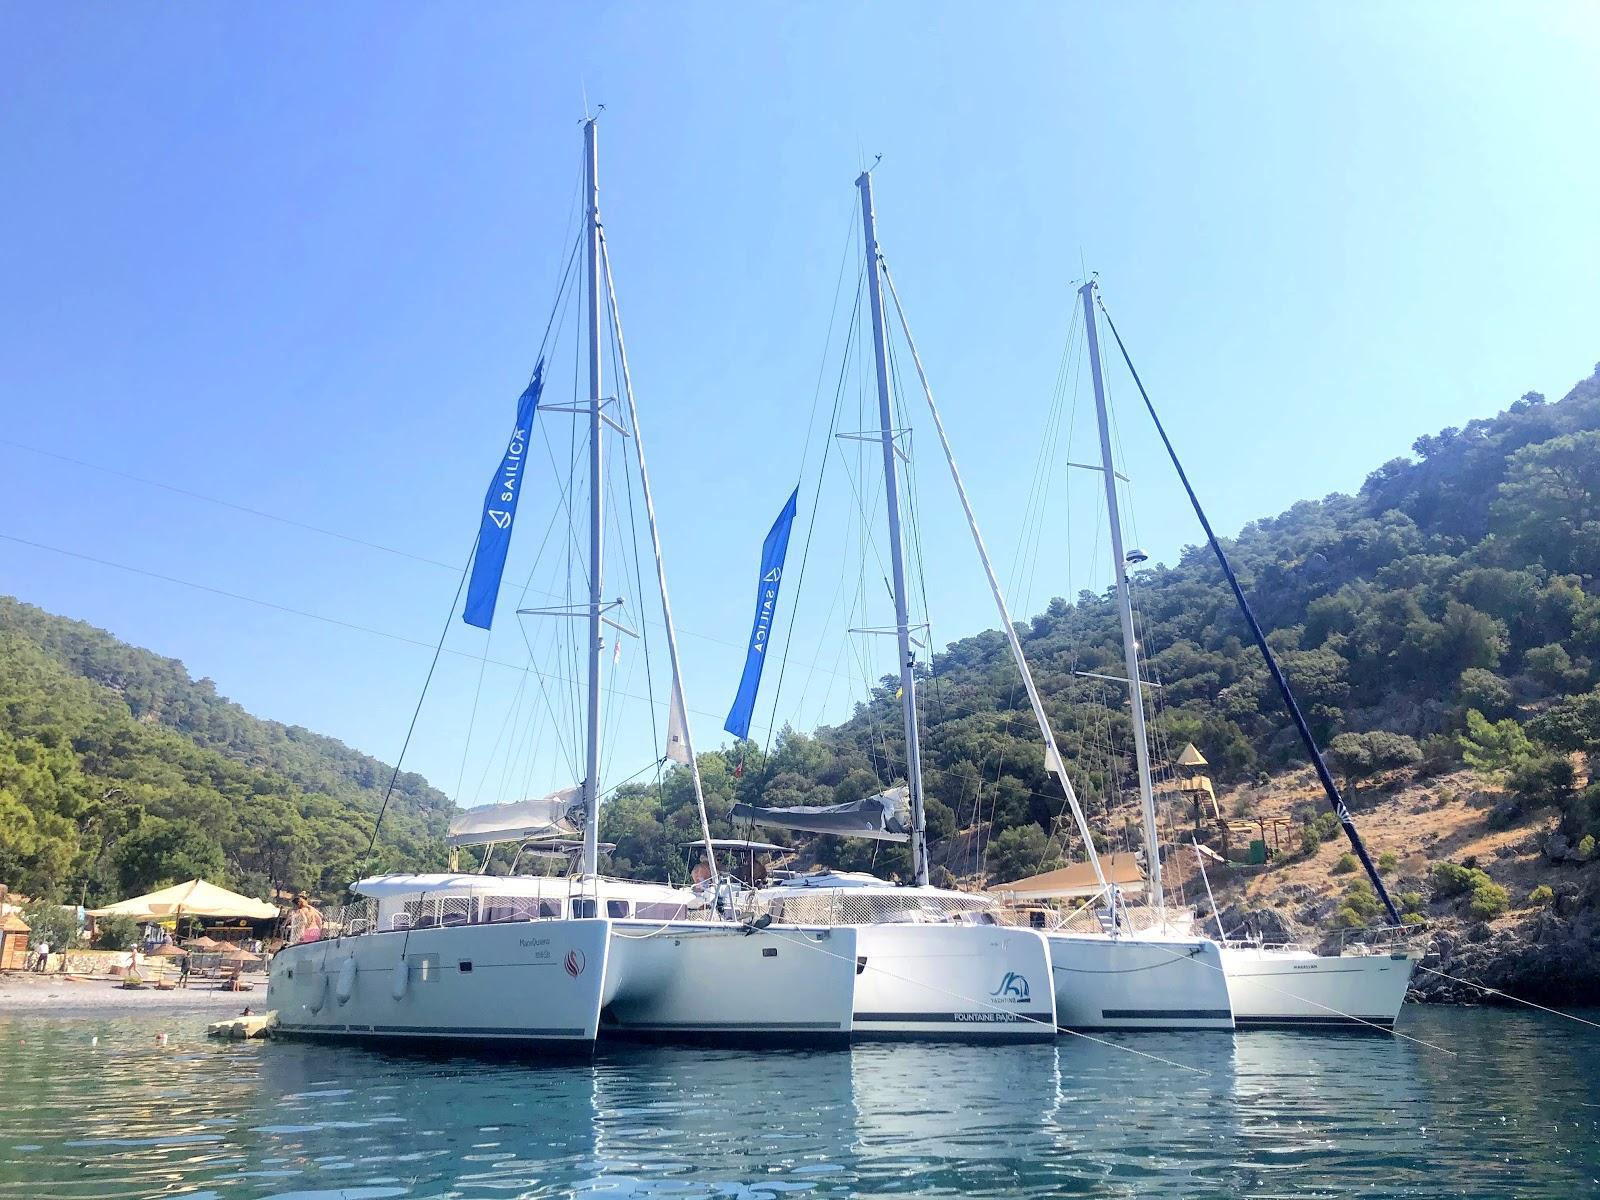 Catamaran in a bay in Turkey